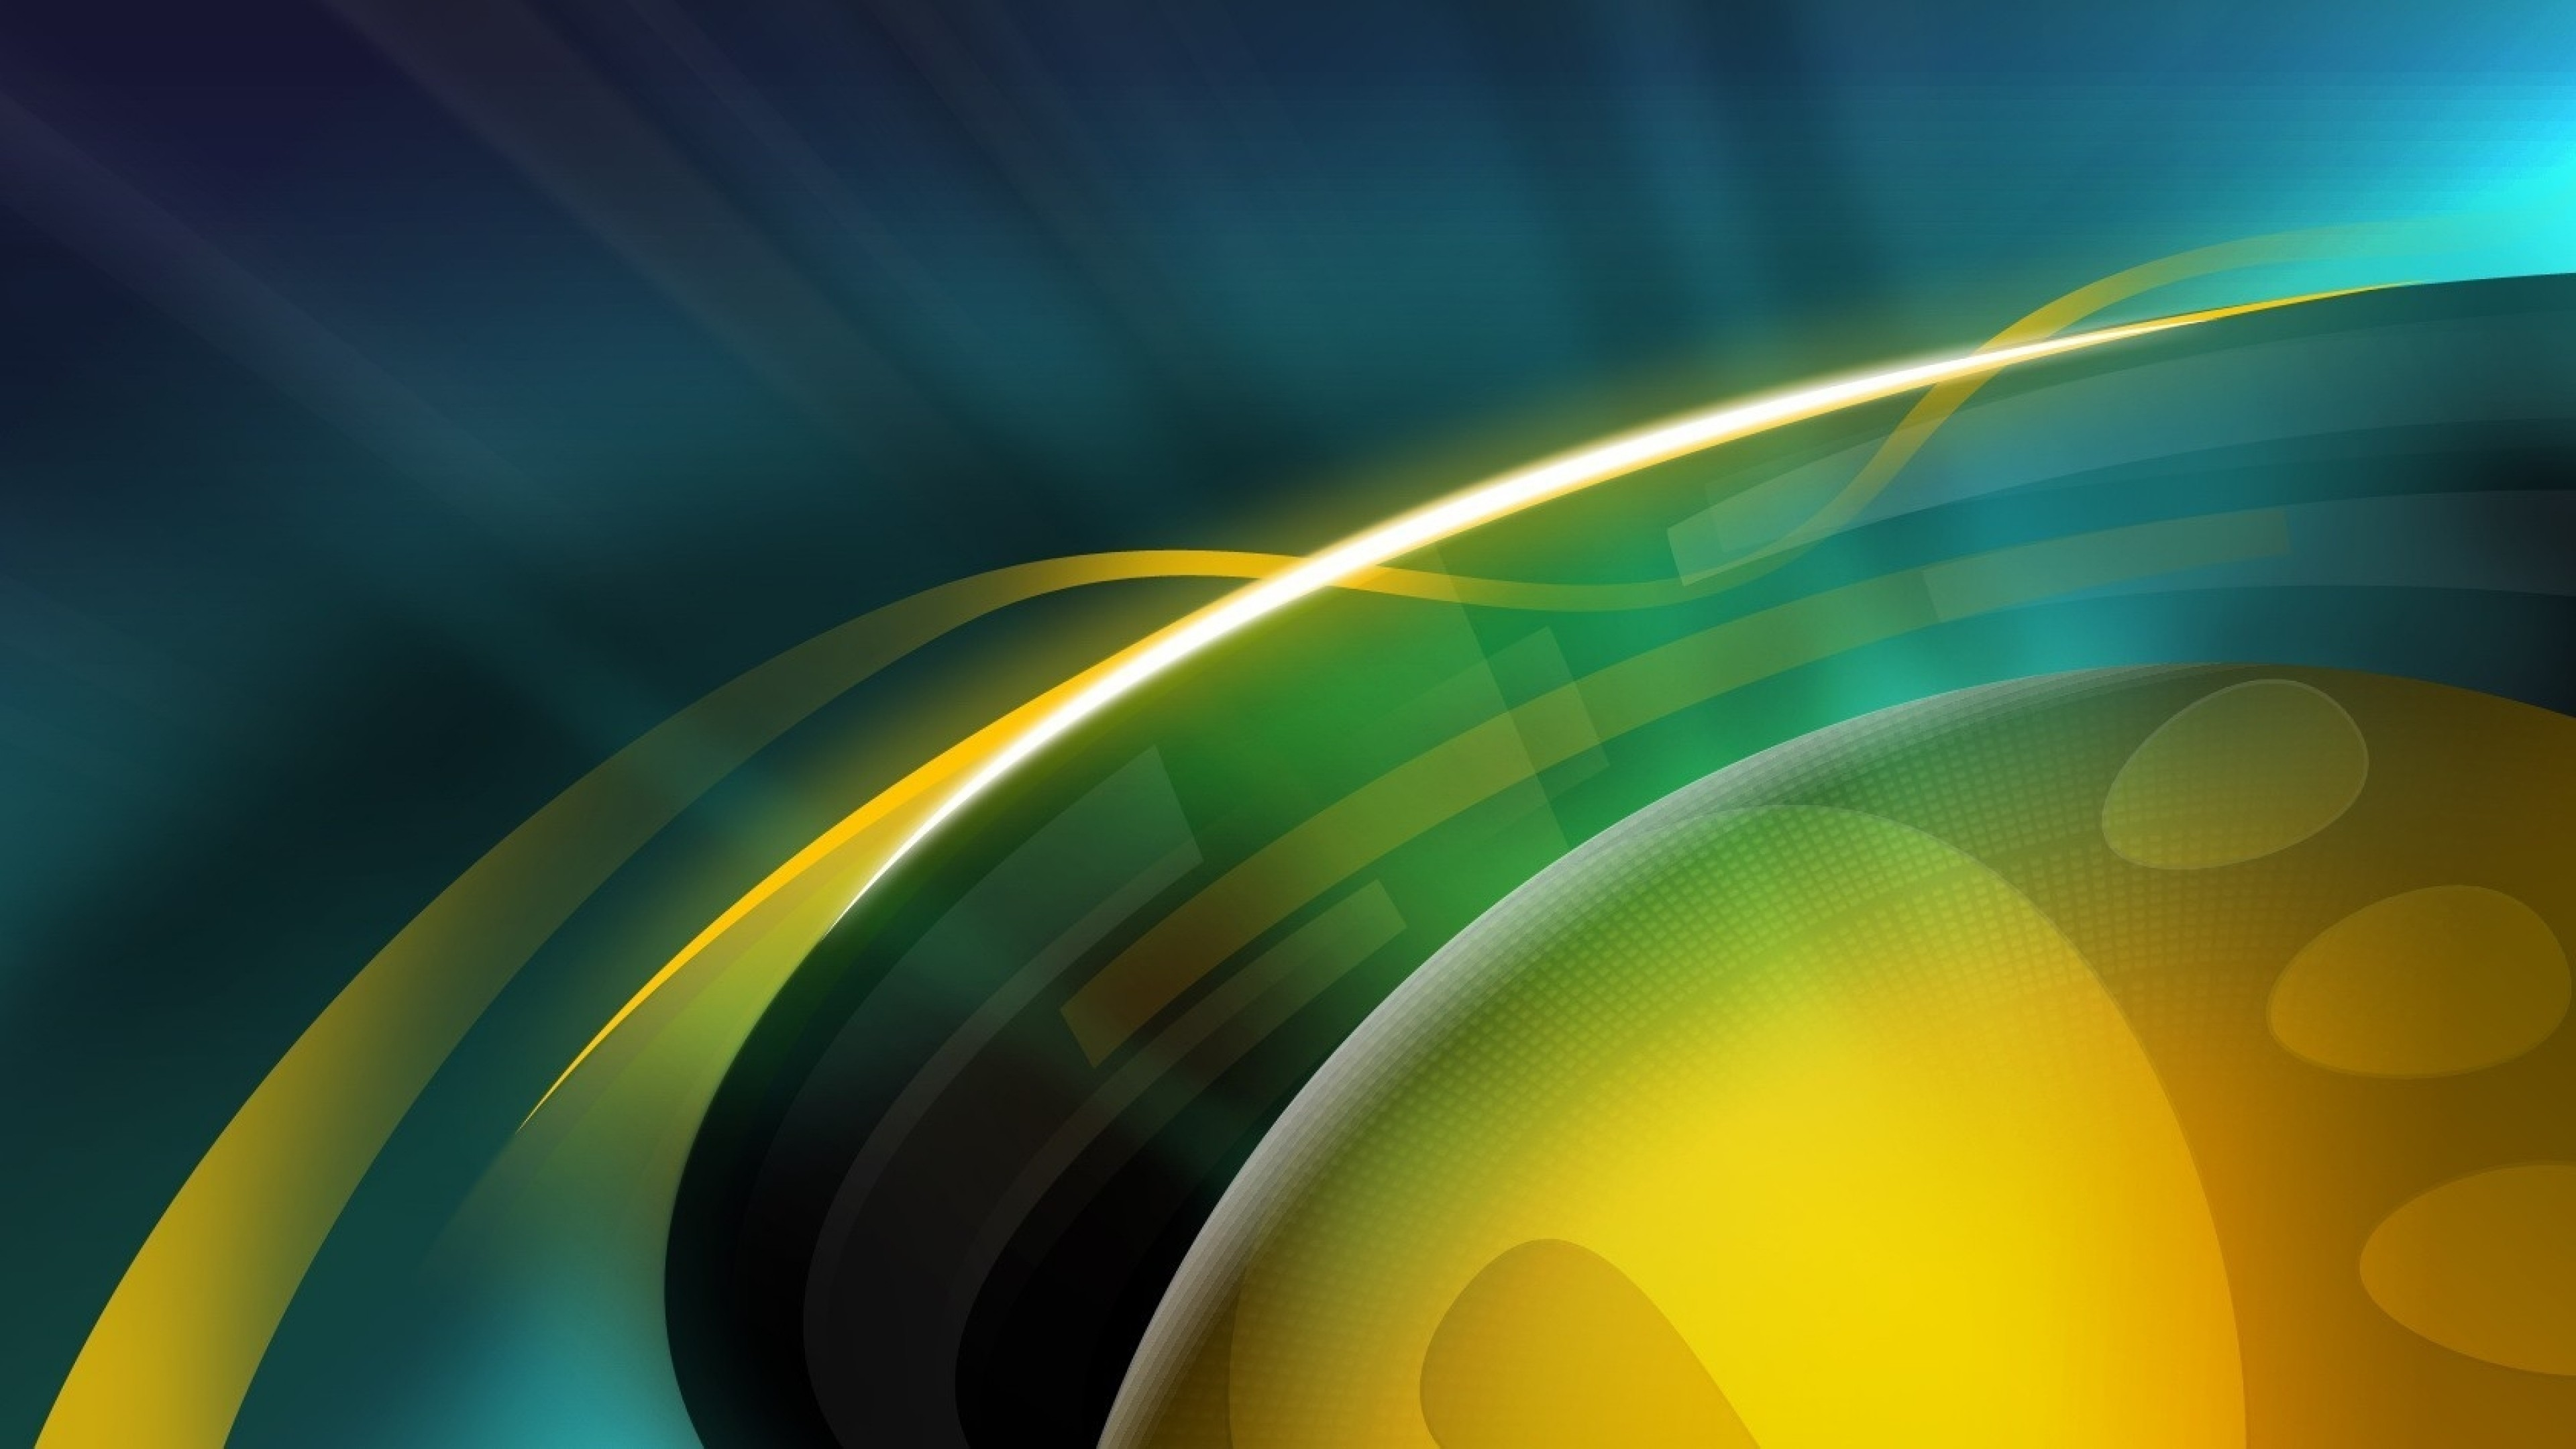 Wallpaper ball, circle, yellow, blue, green